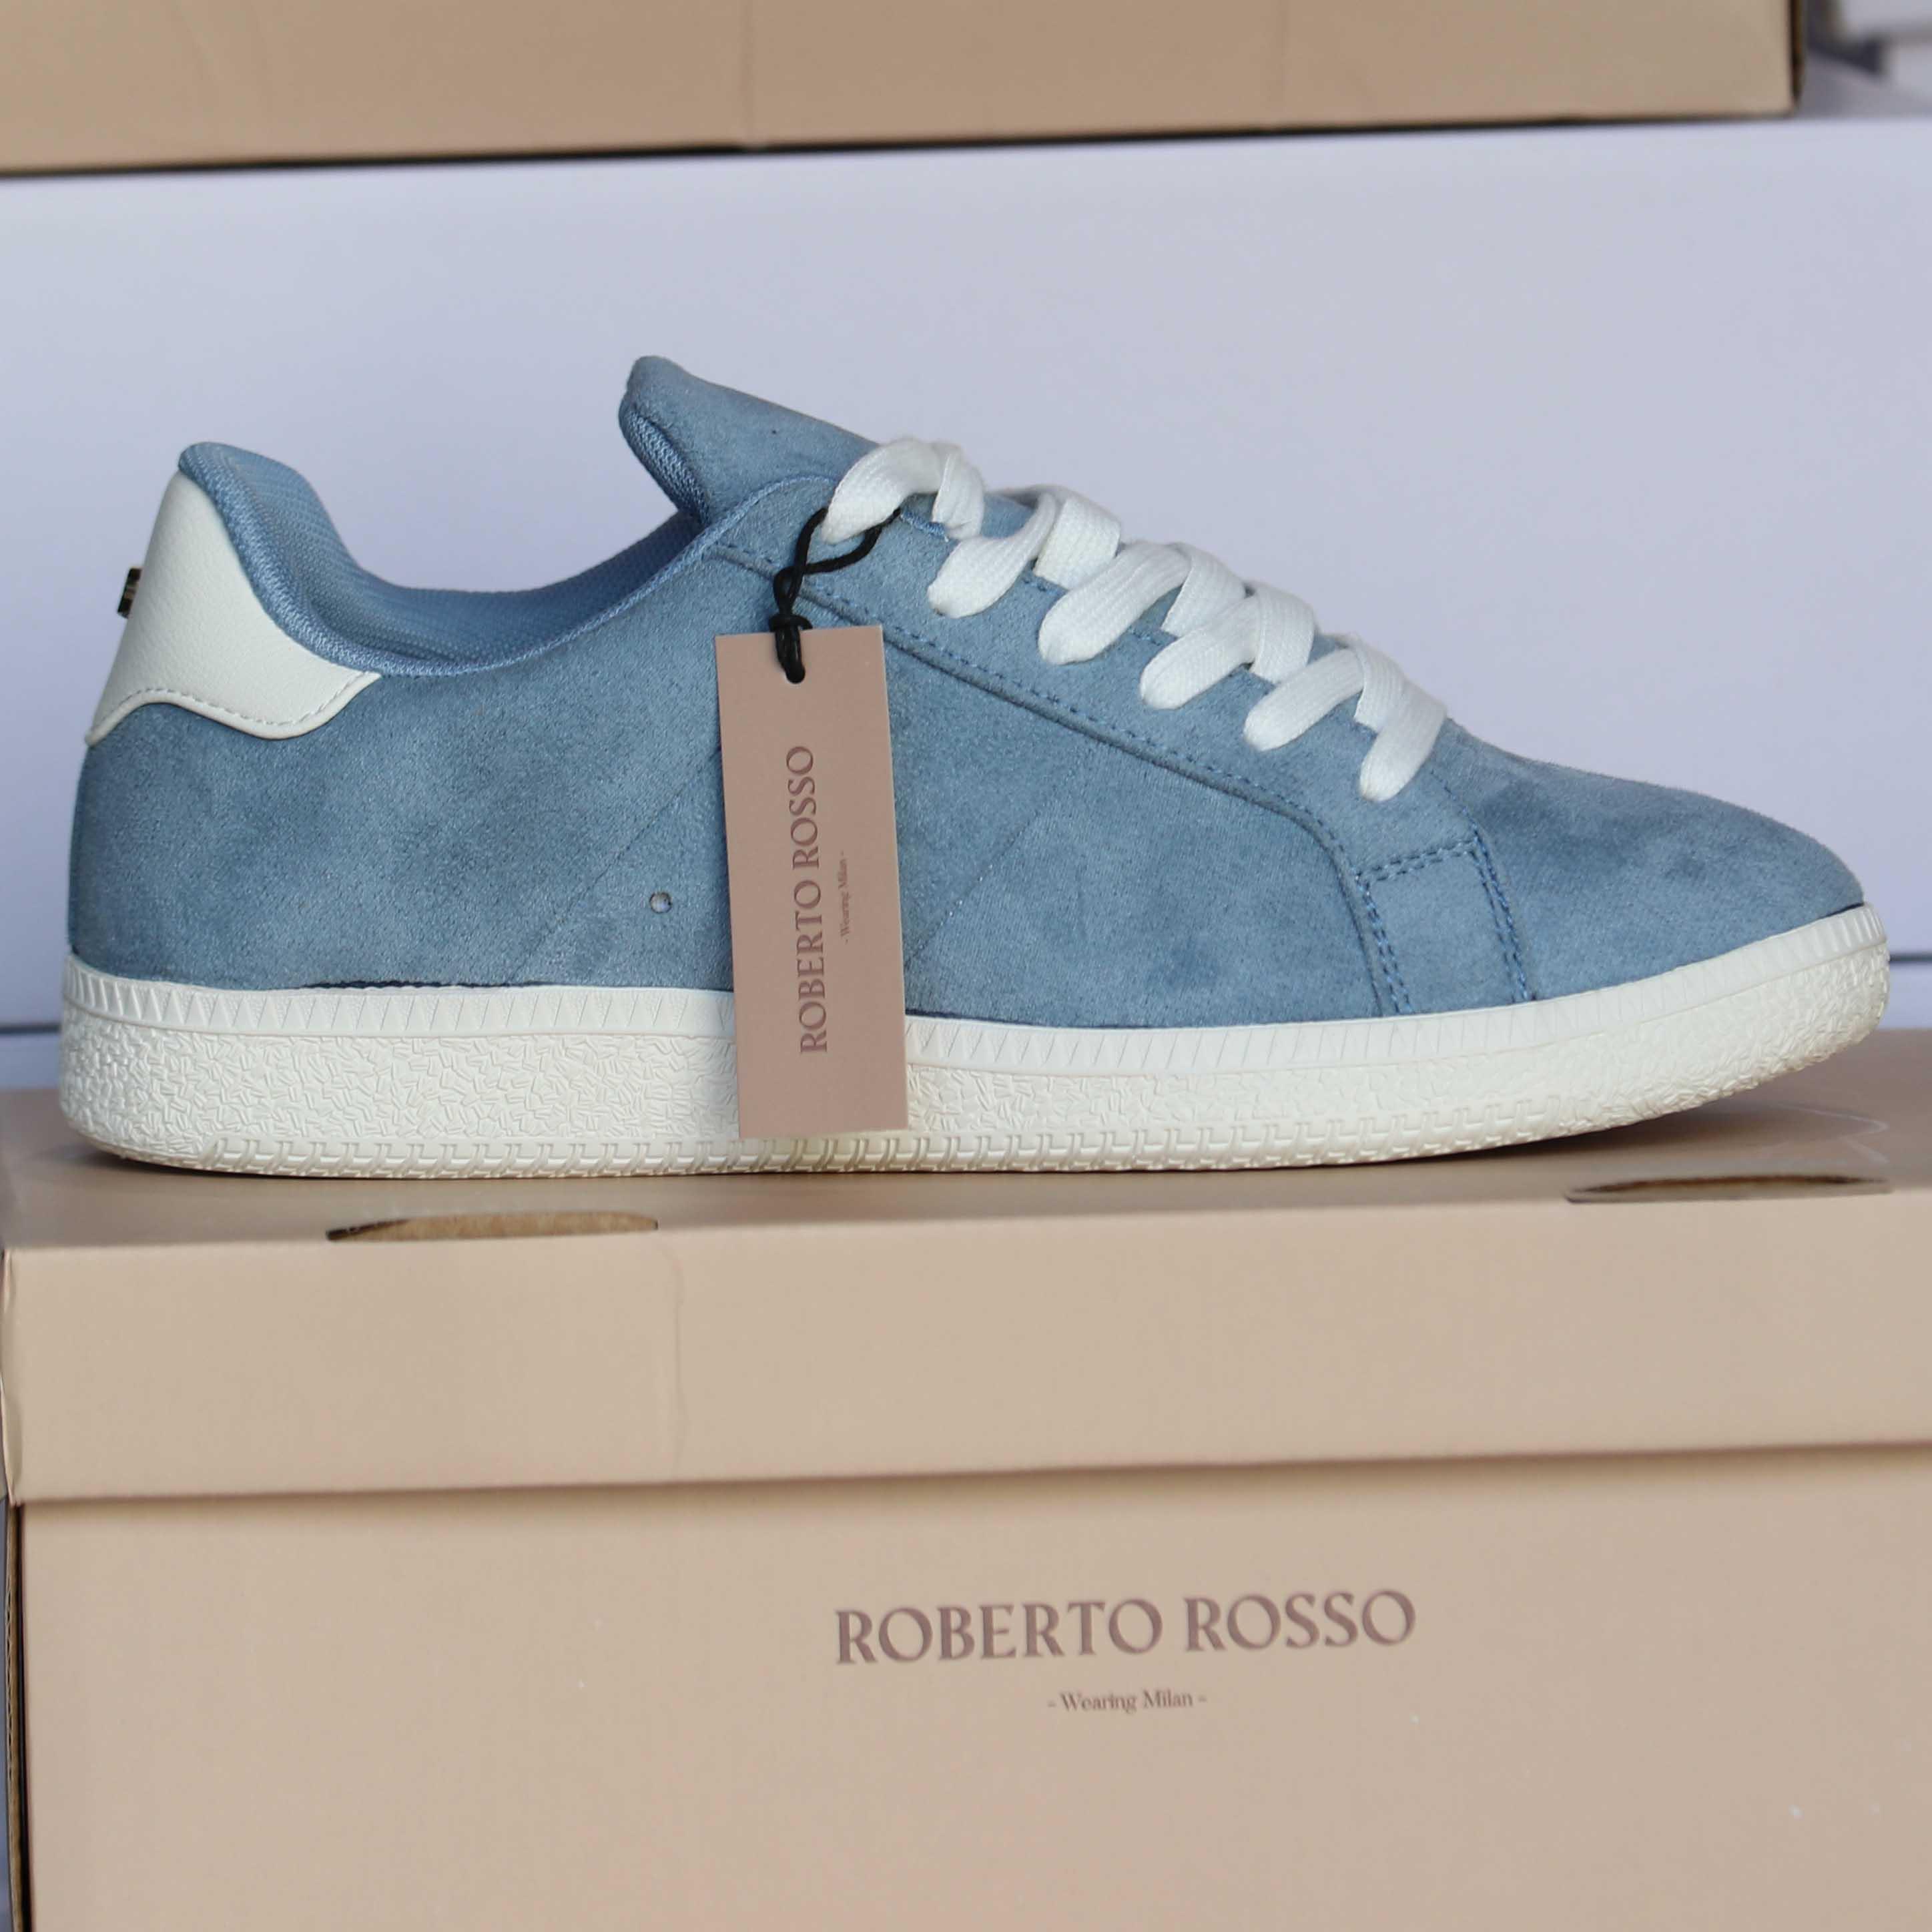 roberto rosso portiva blue sko sommer 4